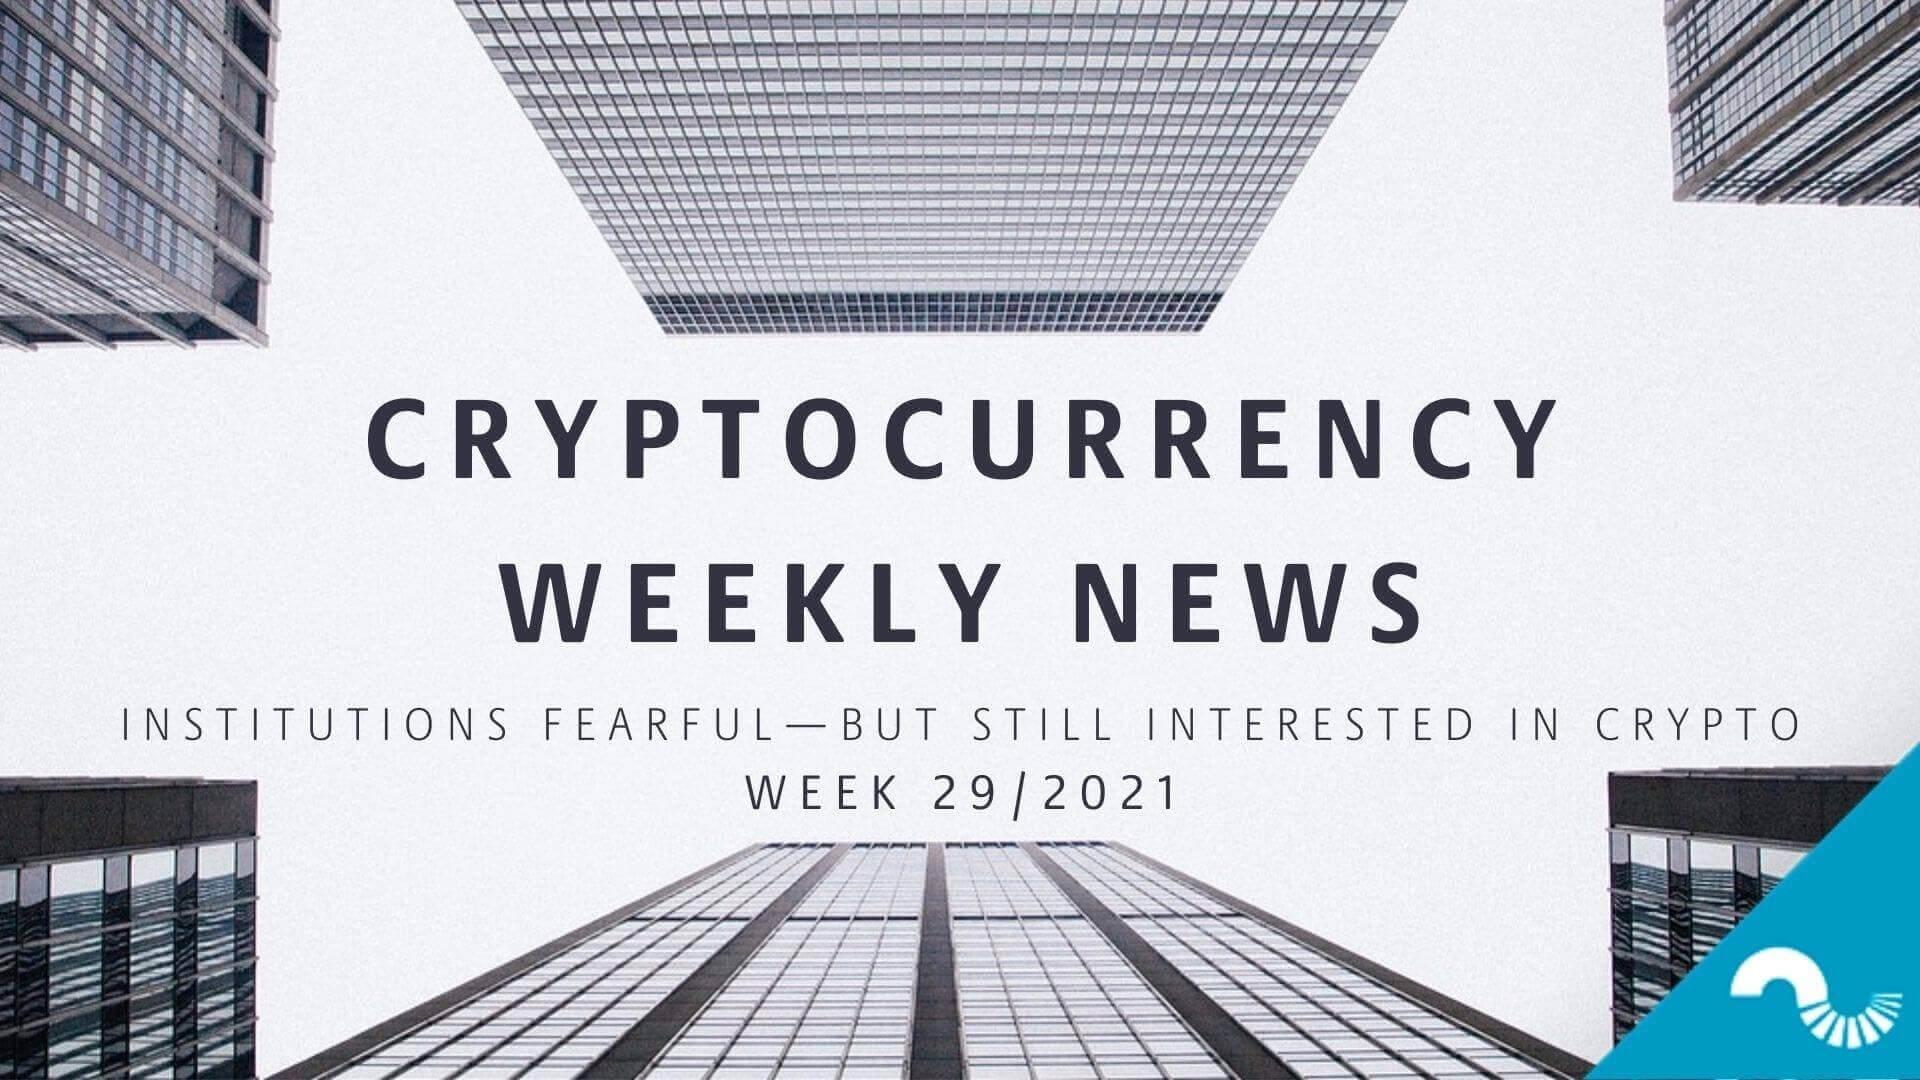 crypto weekly news coinmotion week 29 2021